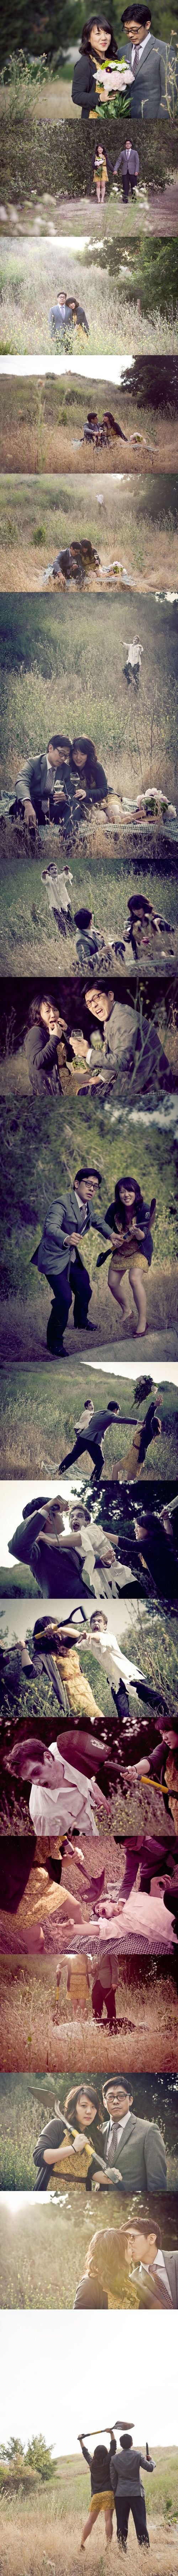 Zombie engagement shoot.... creative! :)